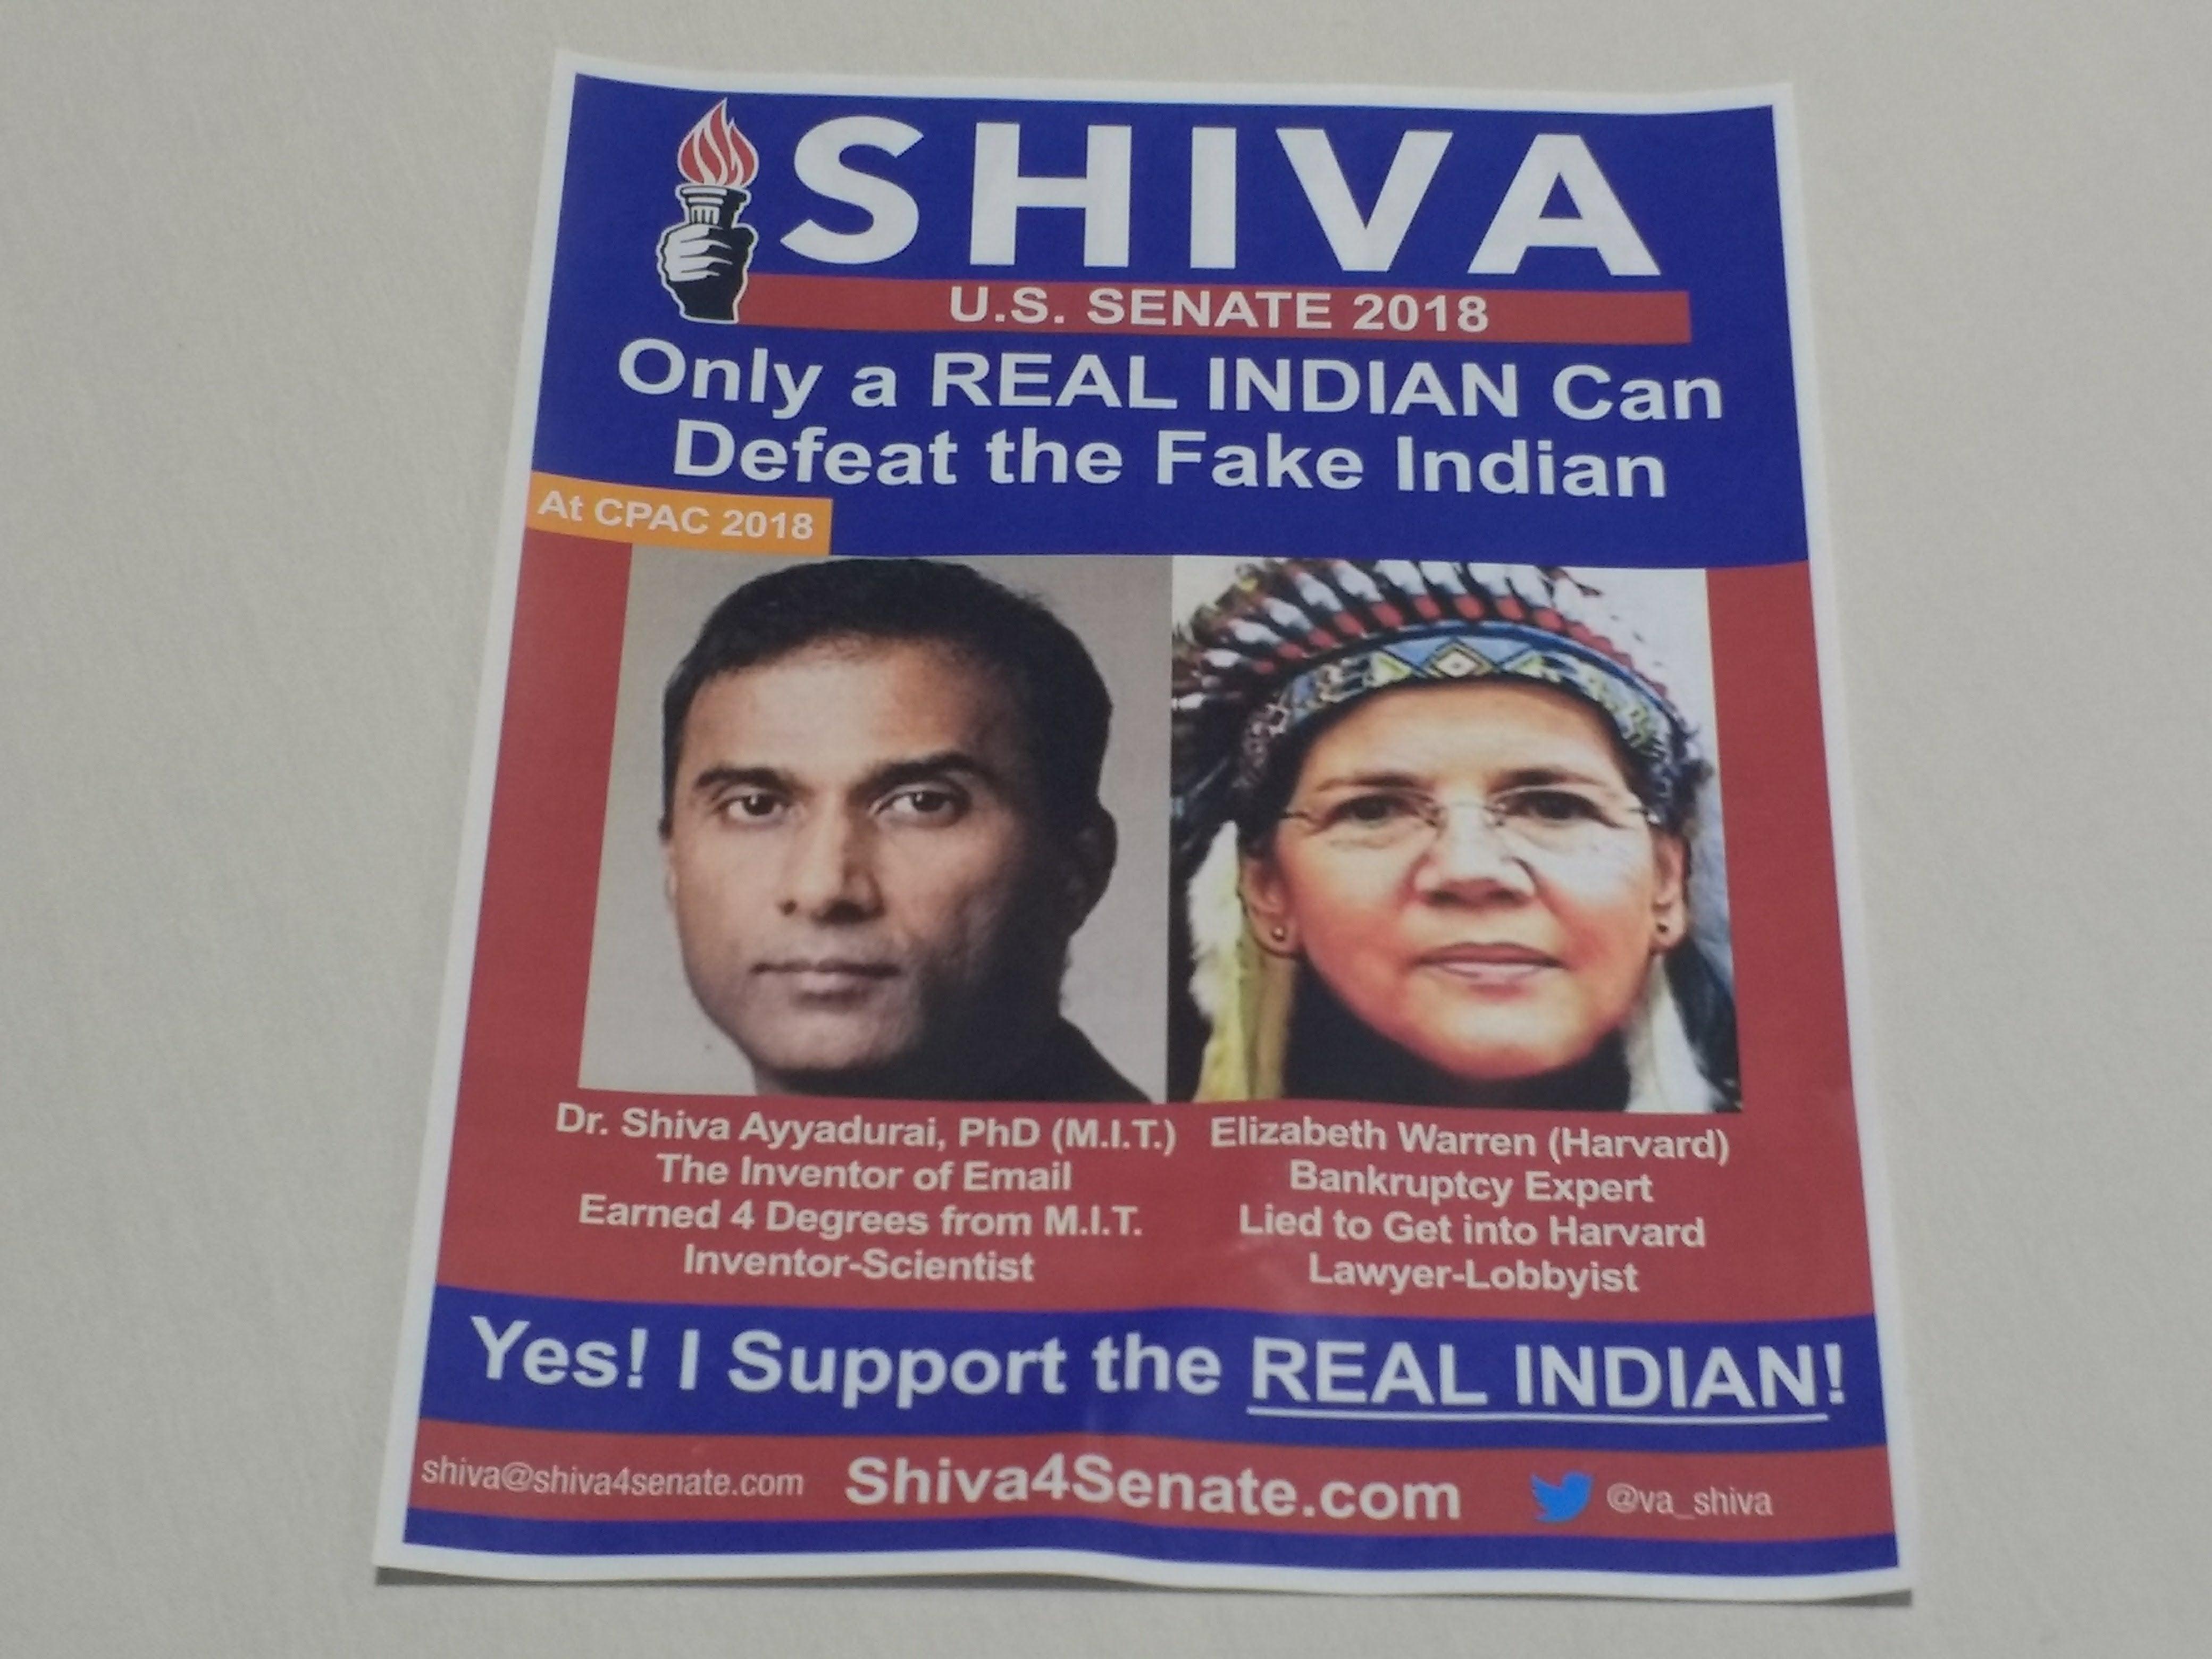 Shiva Ayyadurai is a former Republican independent running to unseat Elizabeth Warren in Massacussetts.